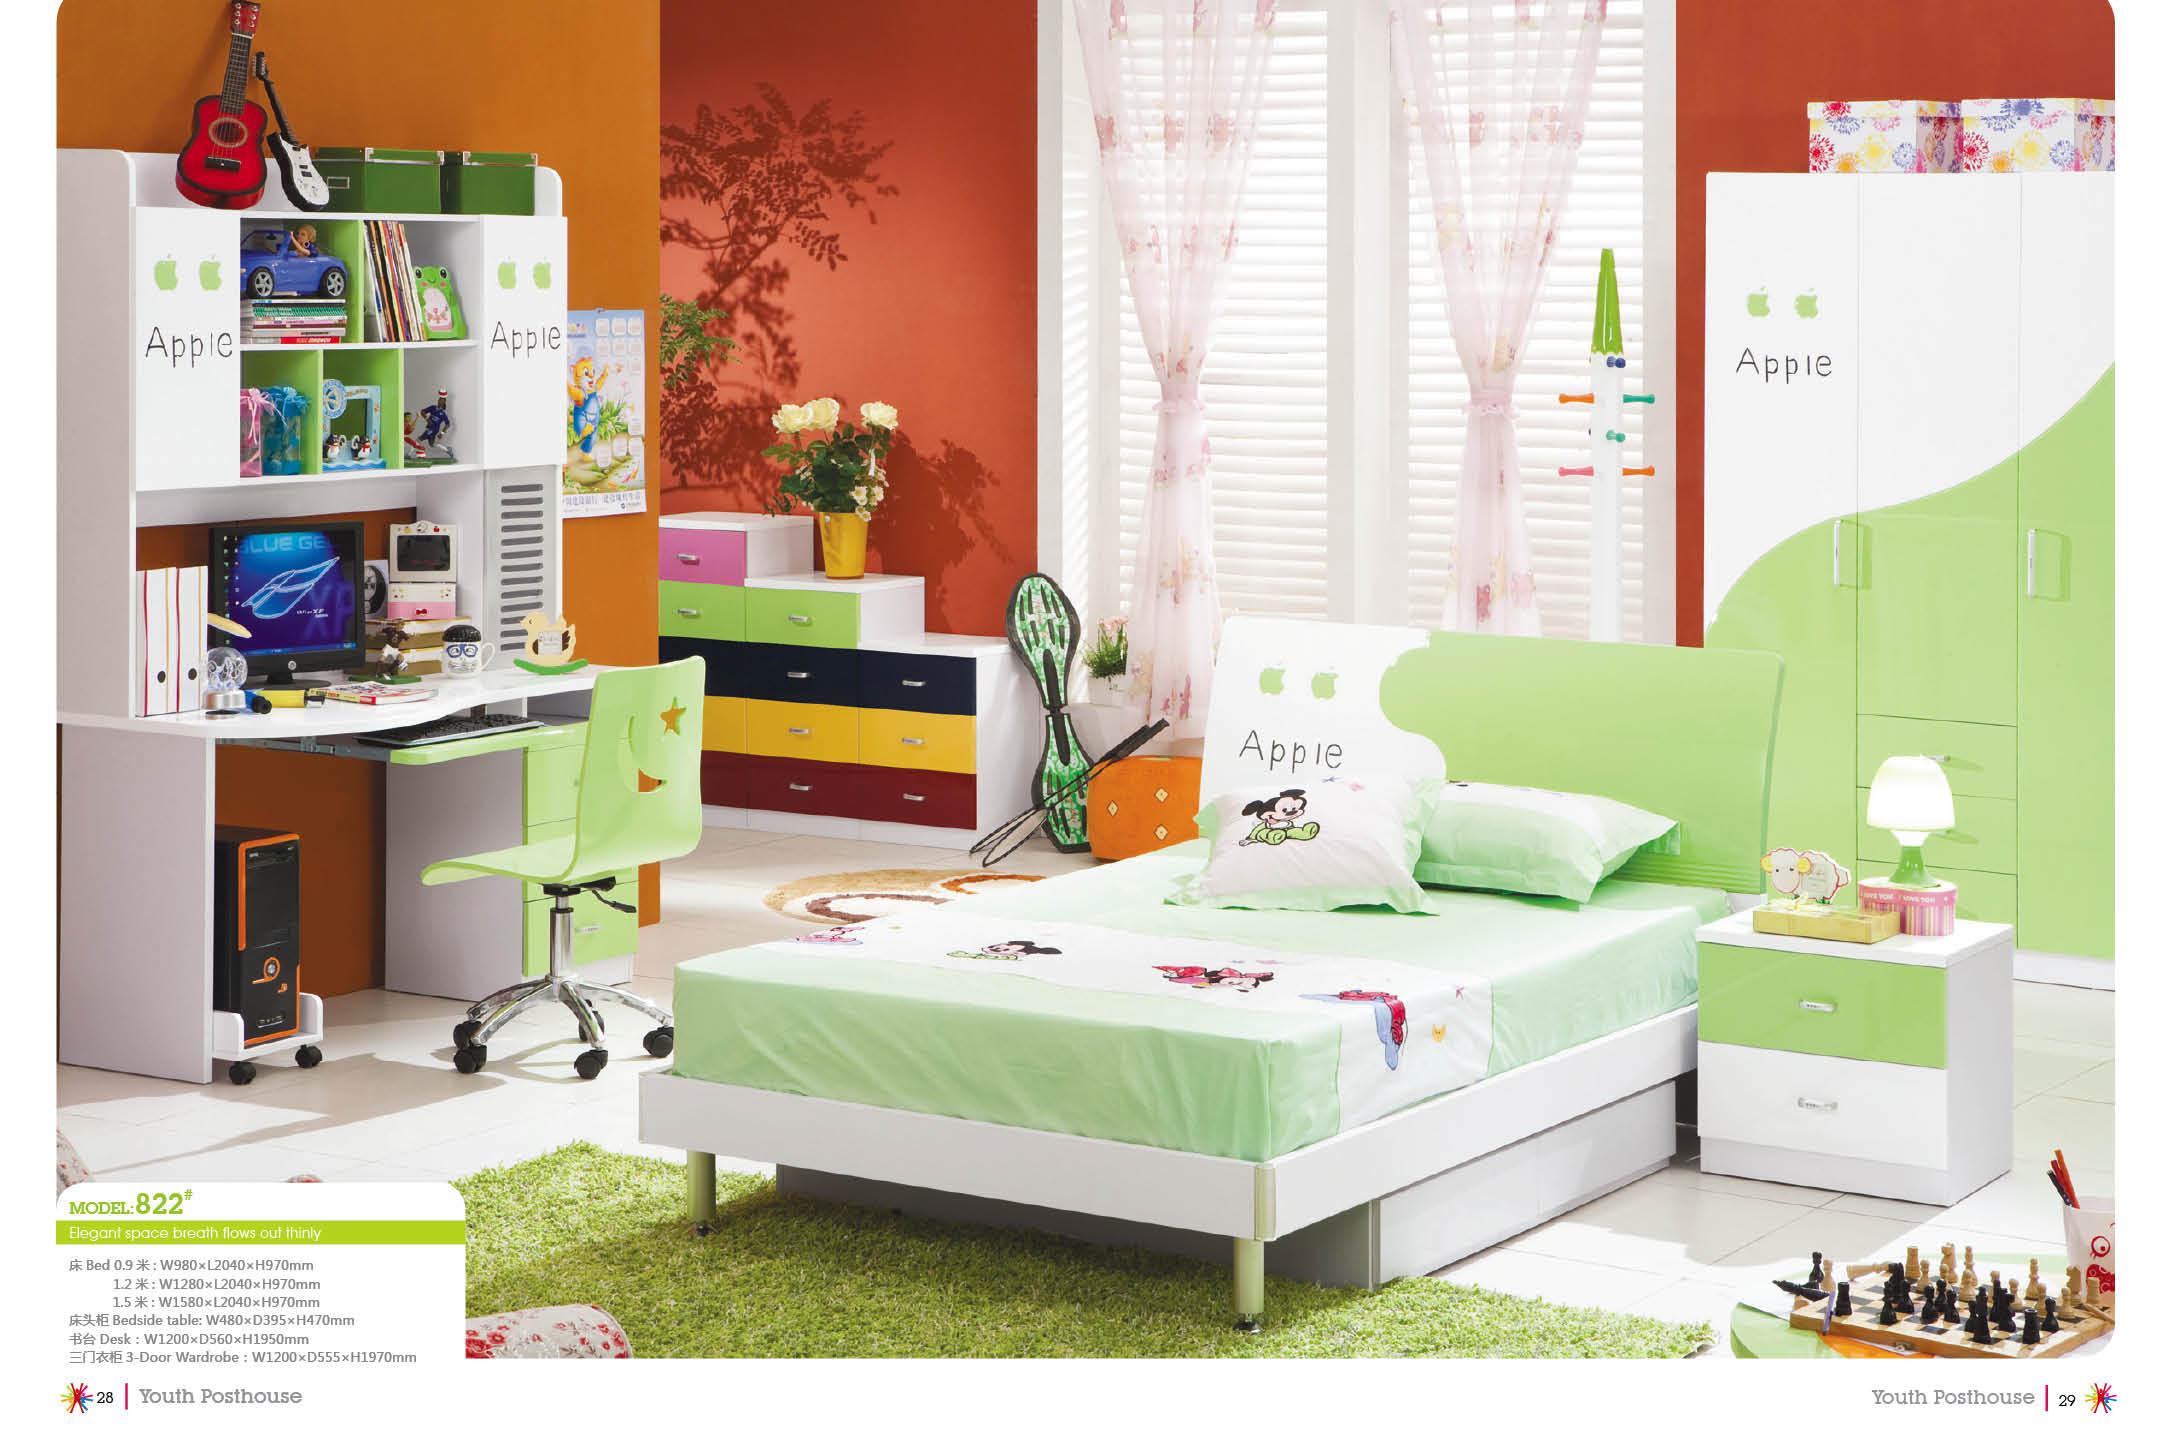 china children furniture bedroom furniture bedroom set 822 photos